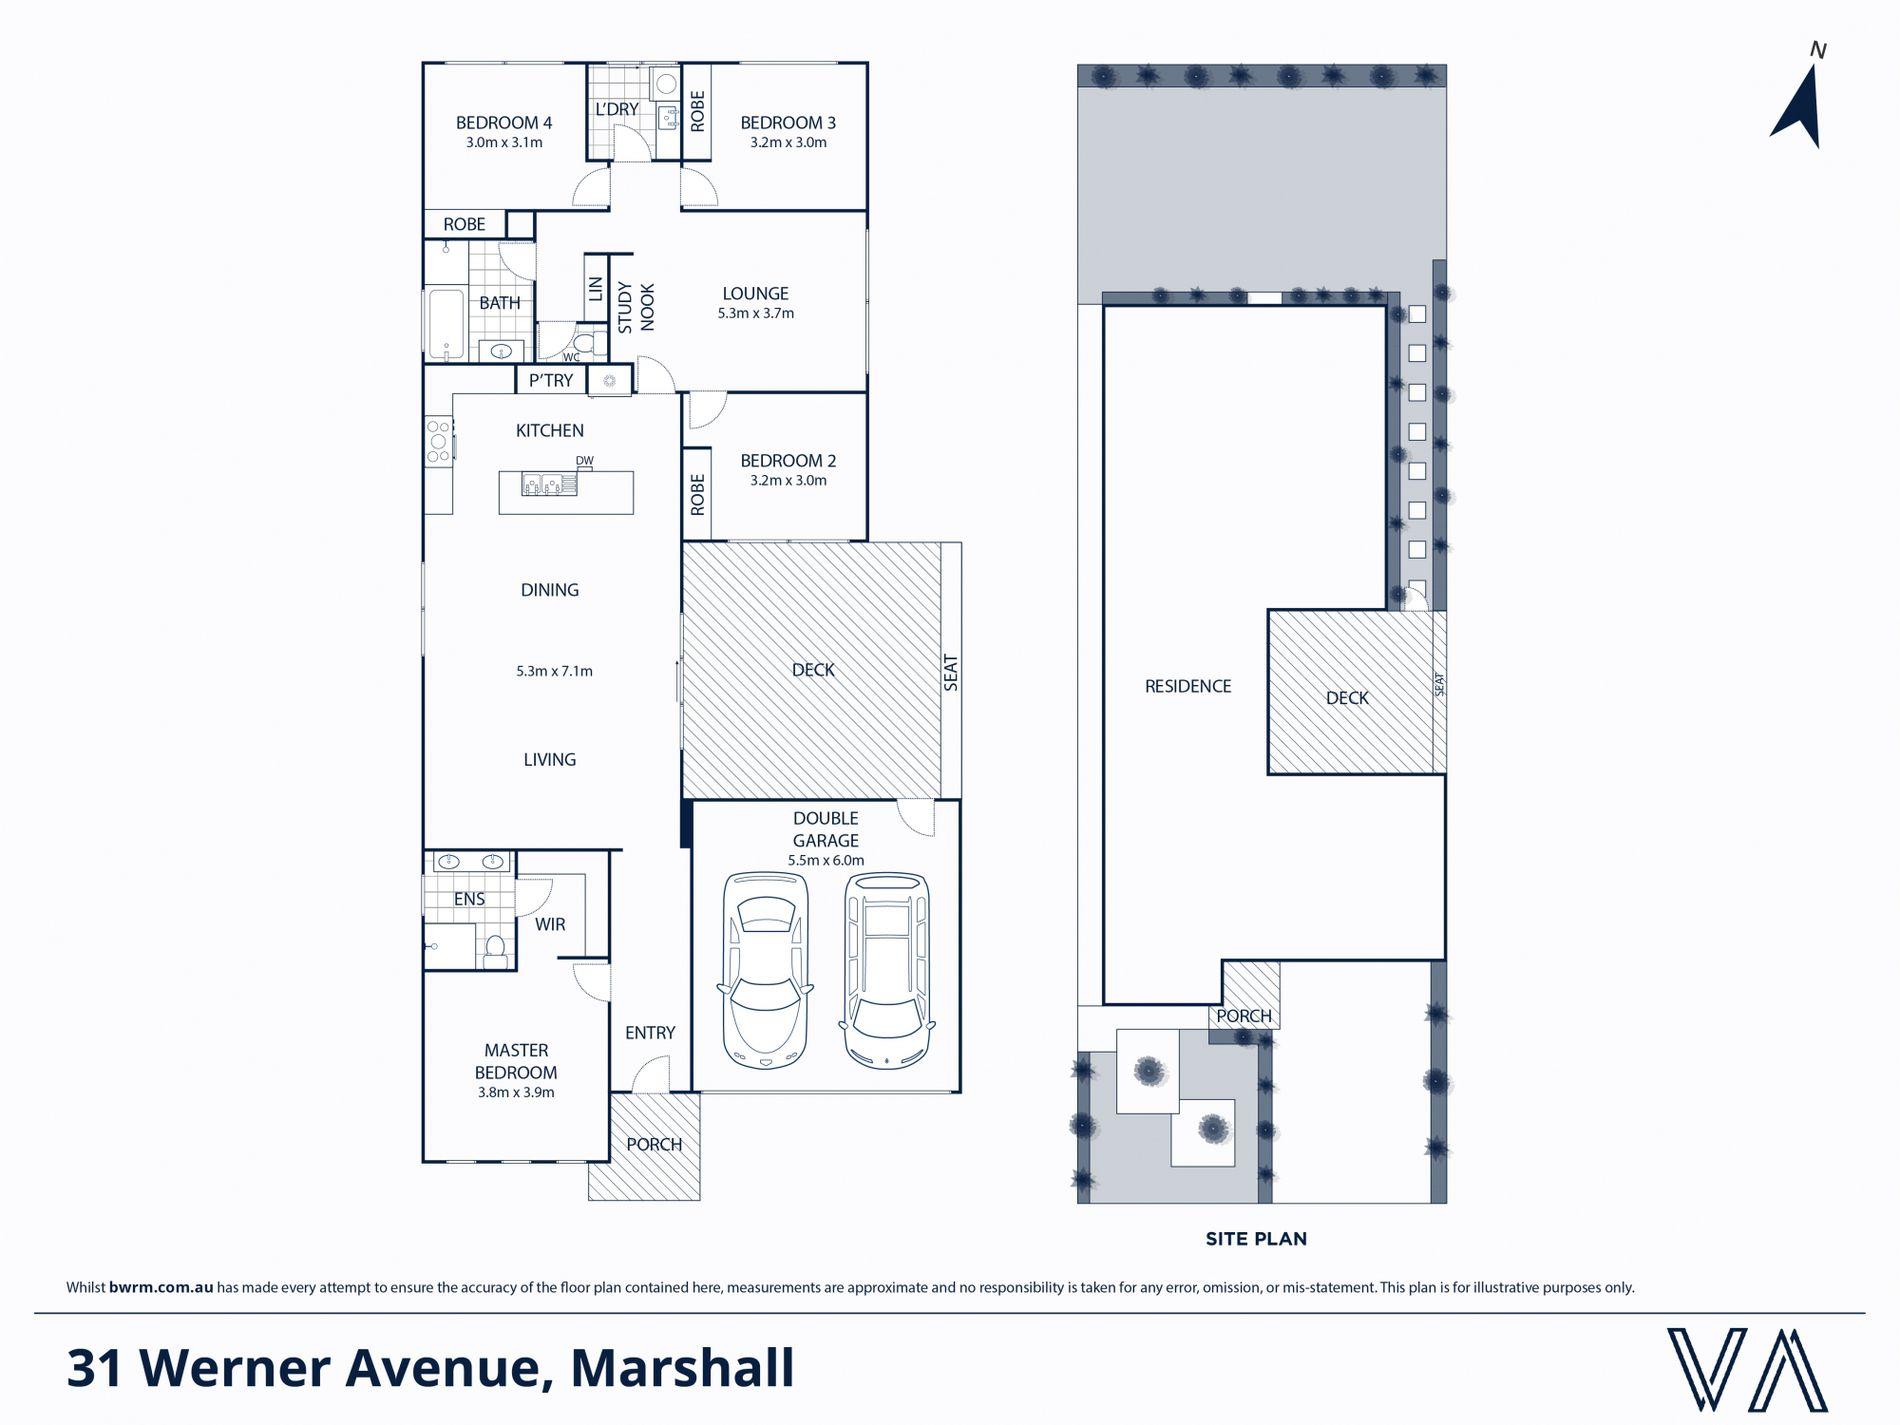 31 Werner Avenue, Marshall